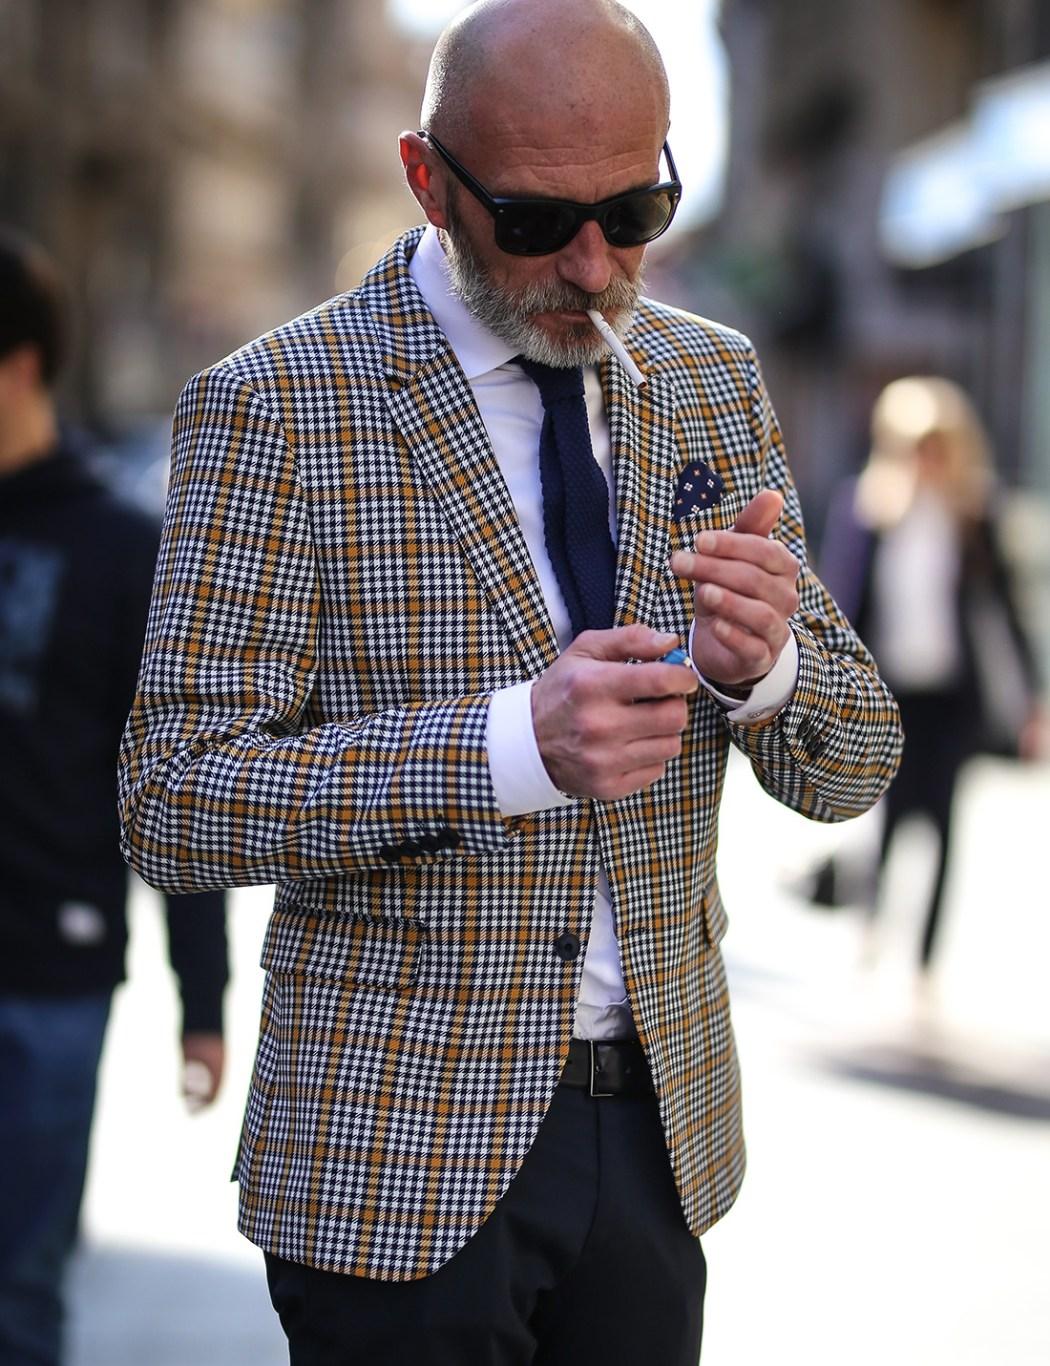 Kako gospodin Kolbas kombinira odjeću iz high street dućana...